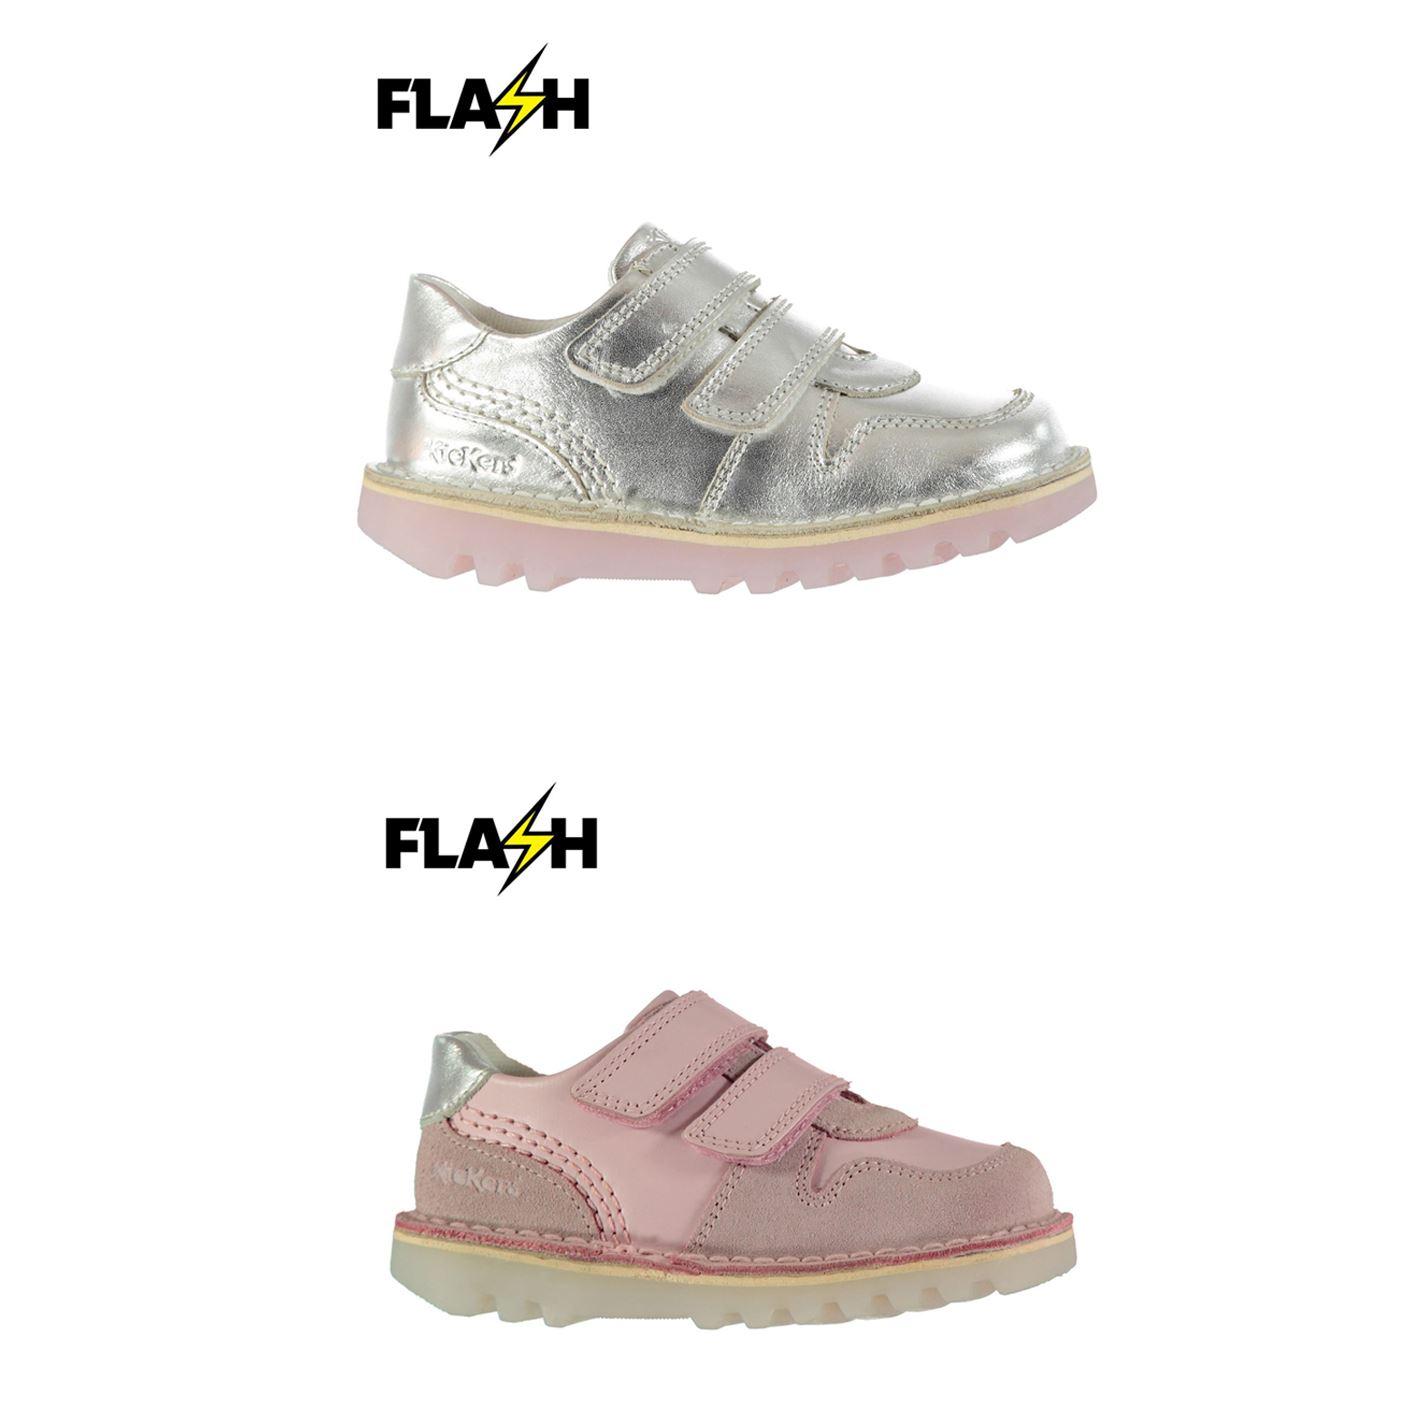 90e2d008 ... Kickers Kick Glow V Shoes Girls Trainers Footwear ...